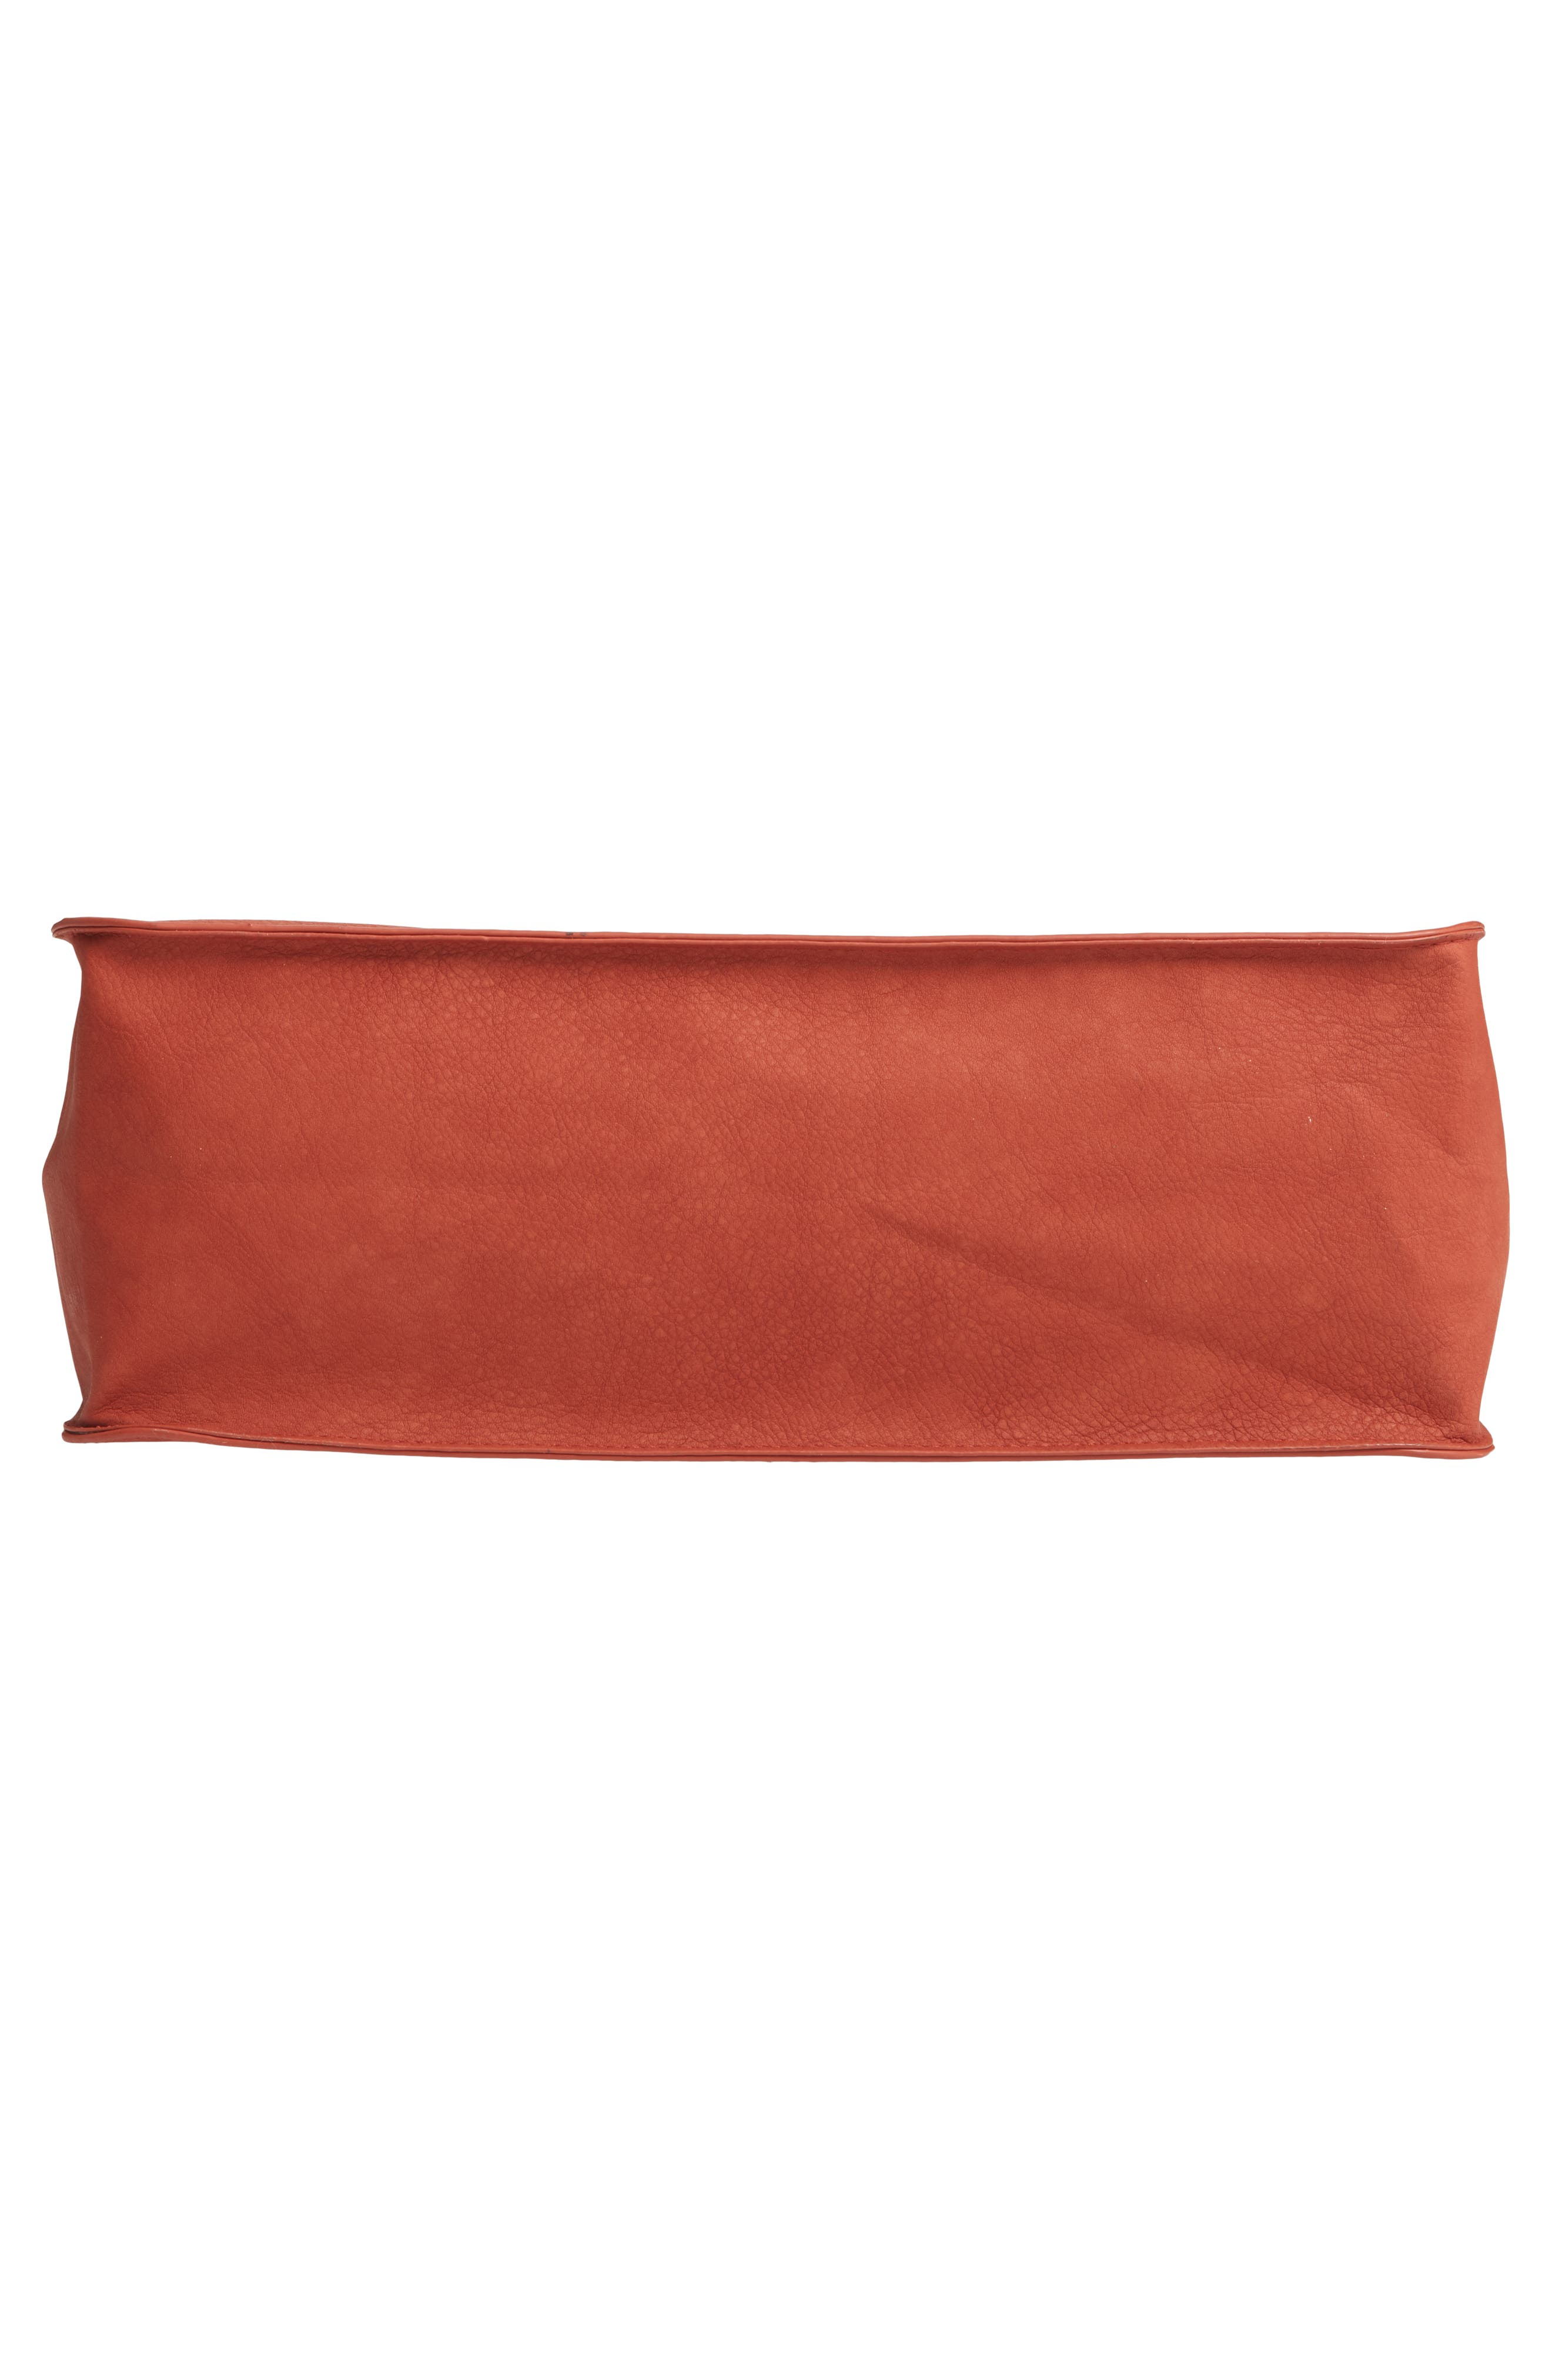 T-SHIRT & JEANS, Faux Leather Top Handle Tote Bag, Alternate thumbnail 7, color, 805